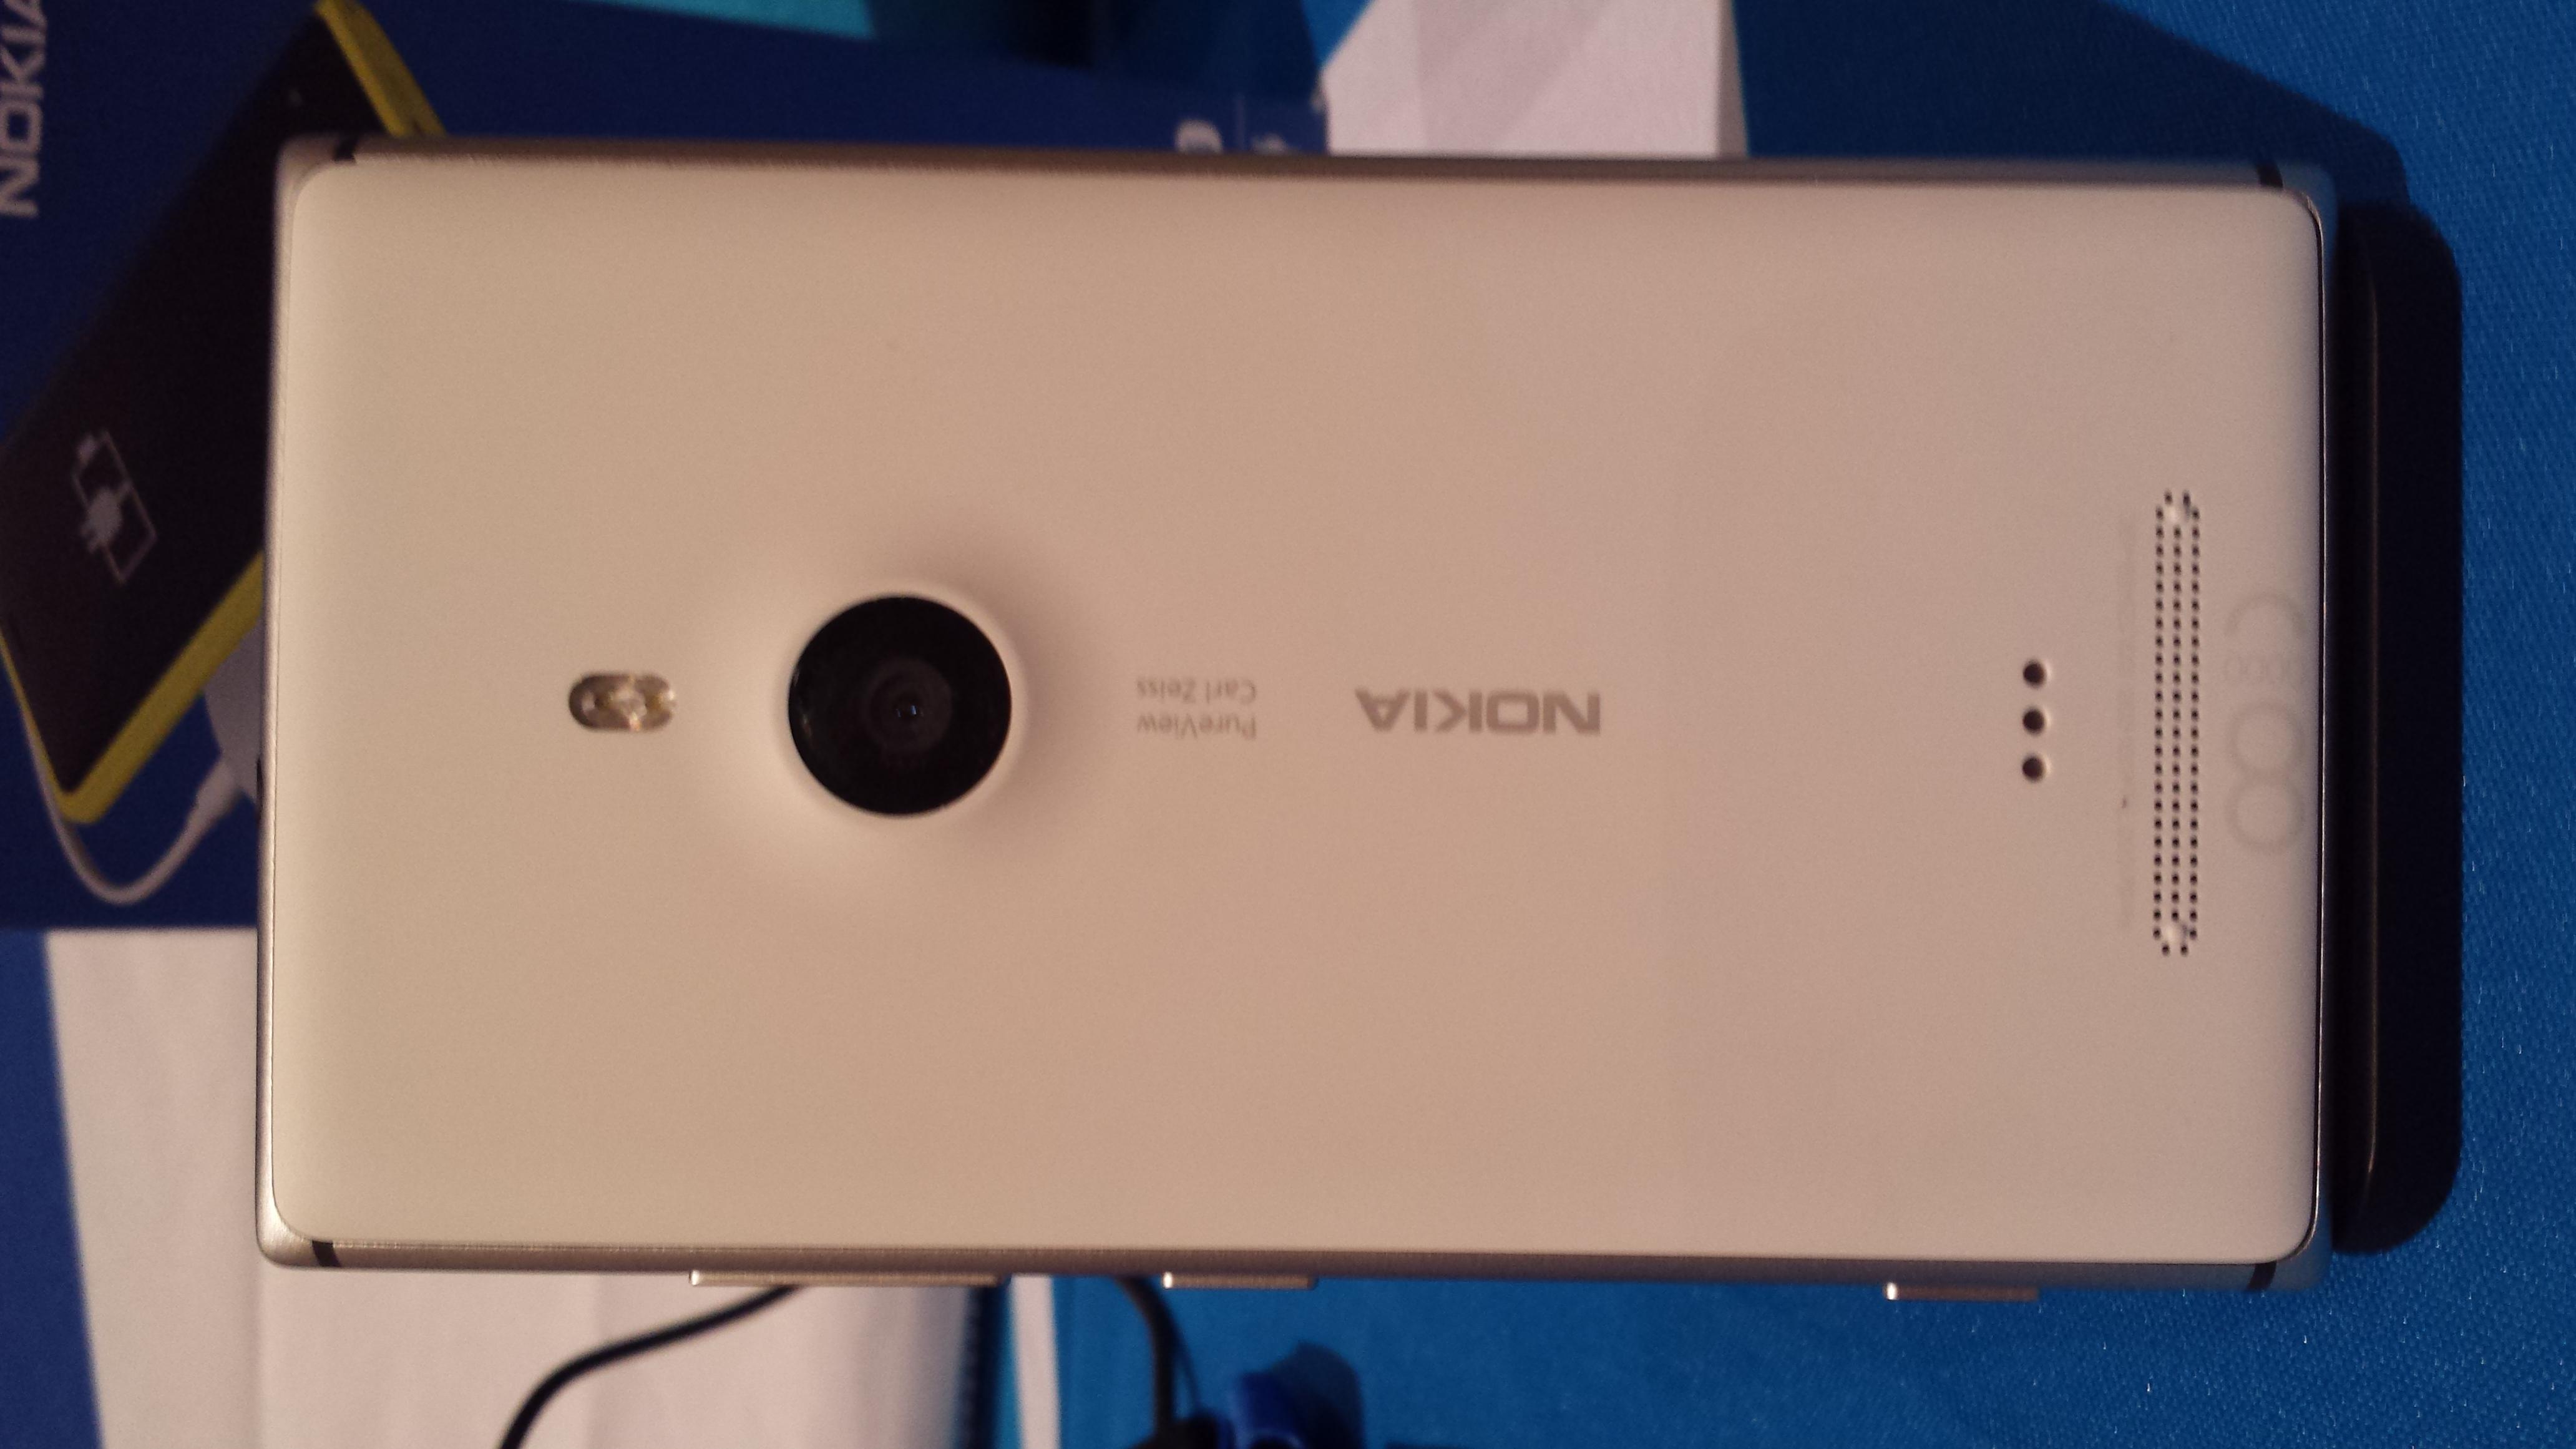 Nokia lumia 925 jpg - File Lumia 925 Reverse Jpg